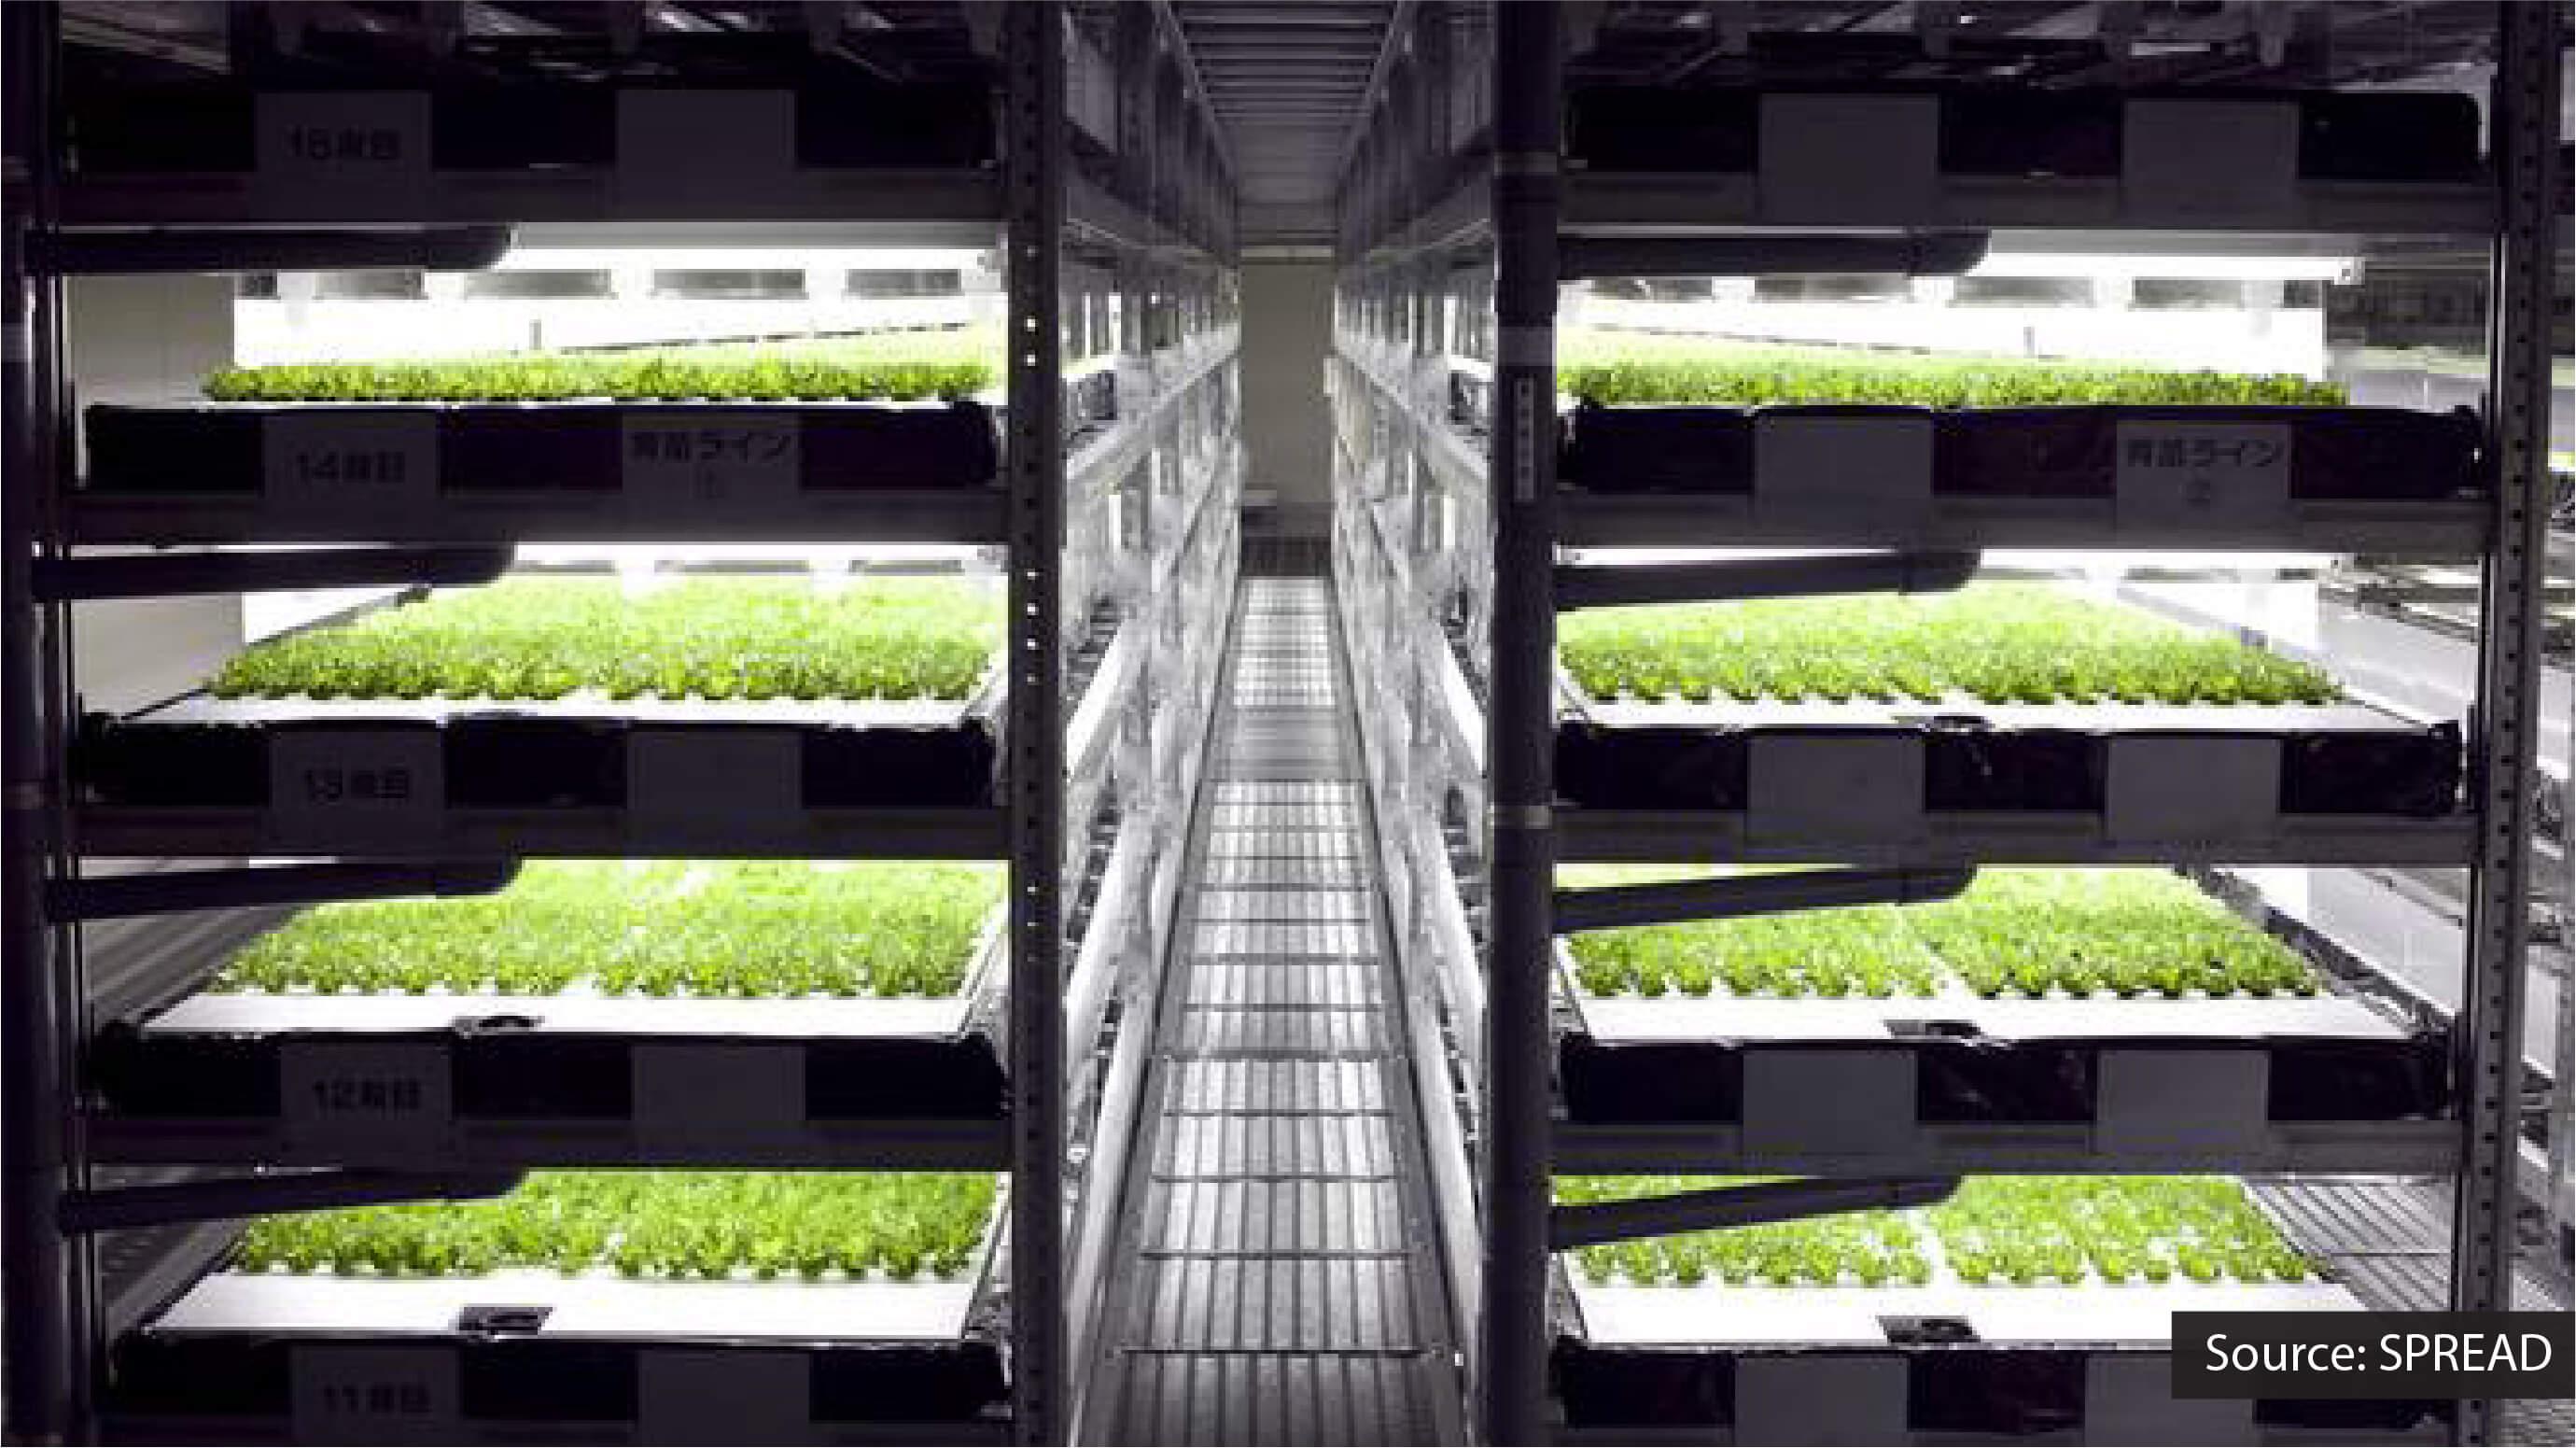 SPREAD vertical farming system.